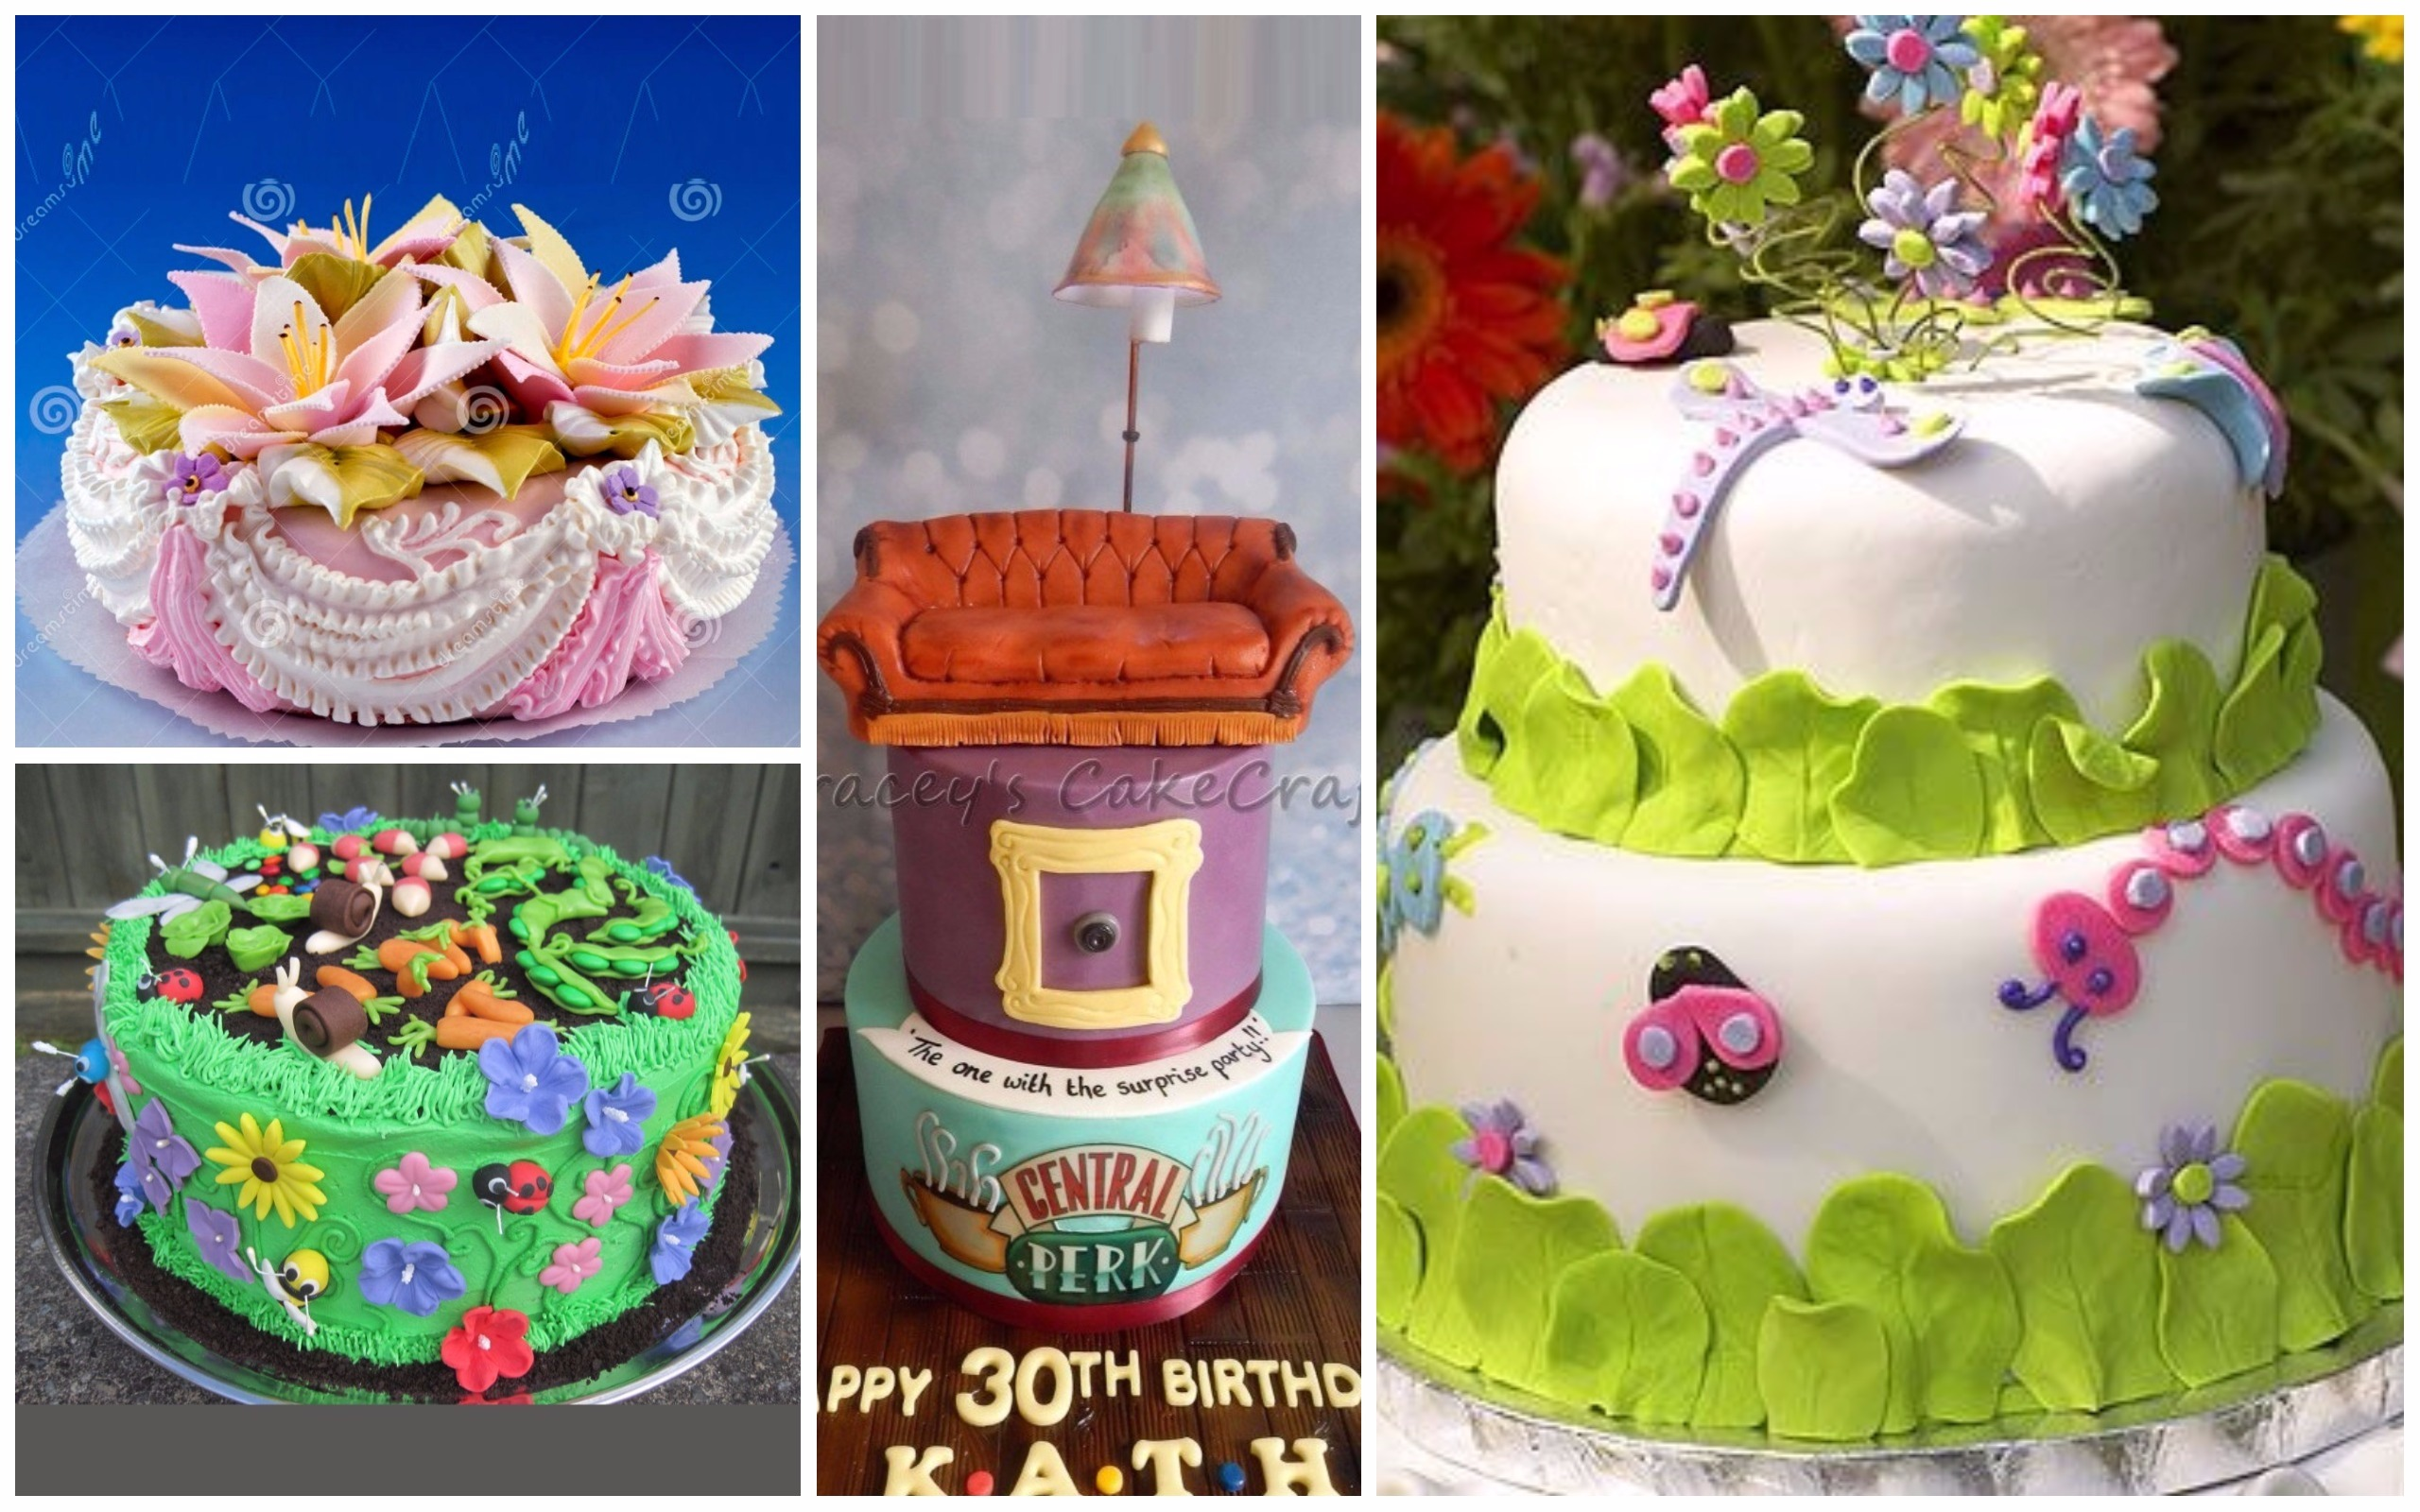 25 Best Cake Designs Ever